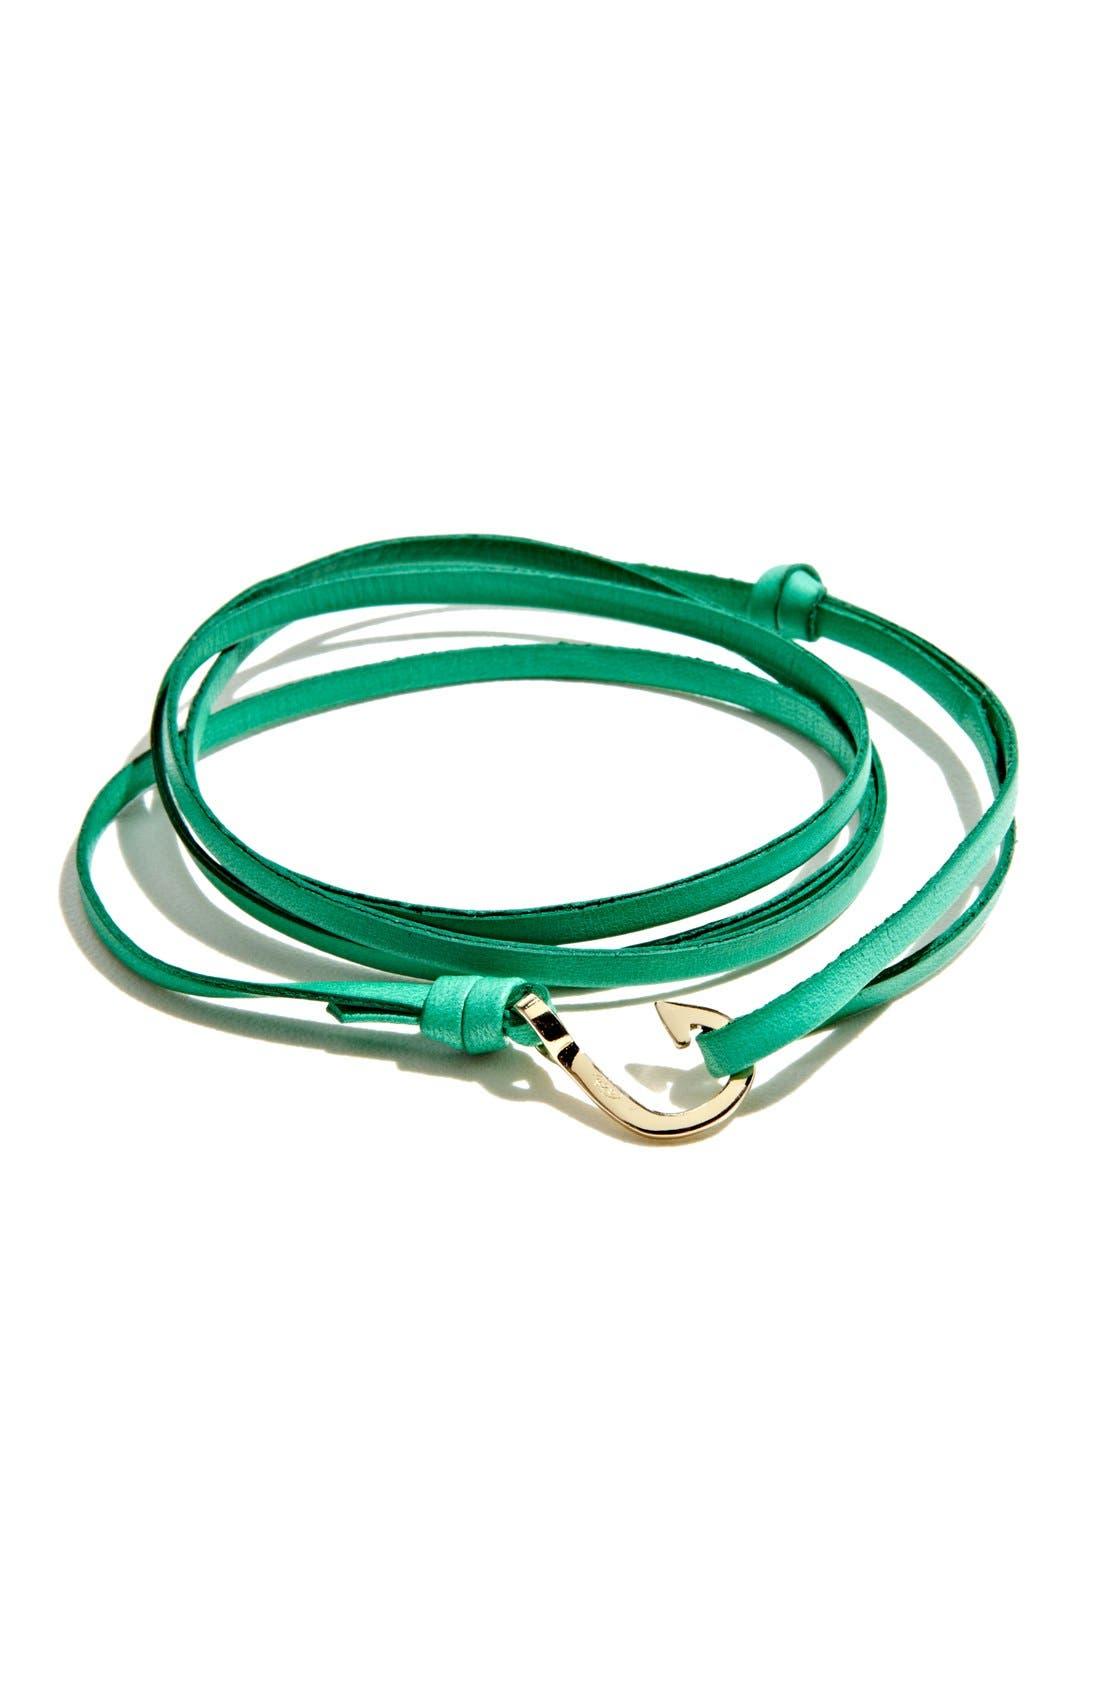 Alternate Image 1 Selected - Miansai Gold Mini Hook Leather Bracelet